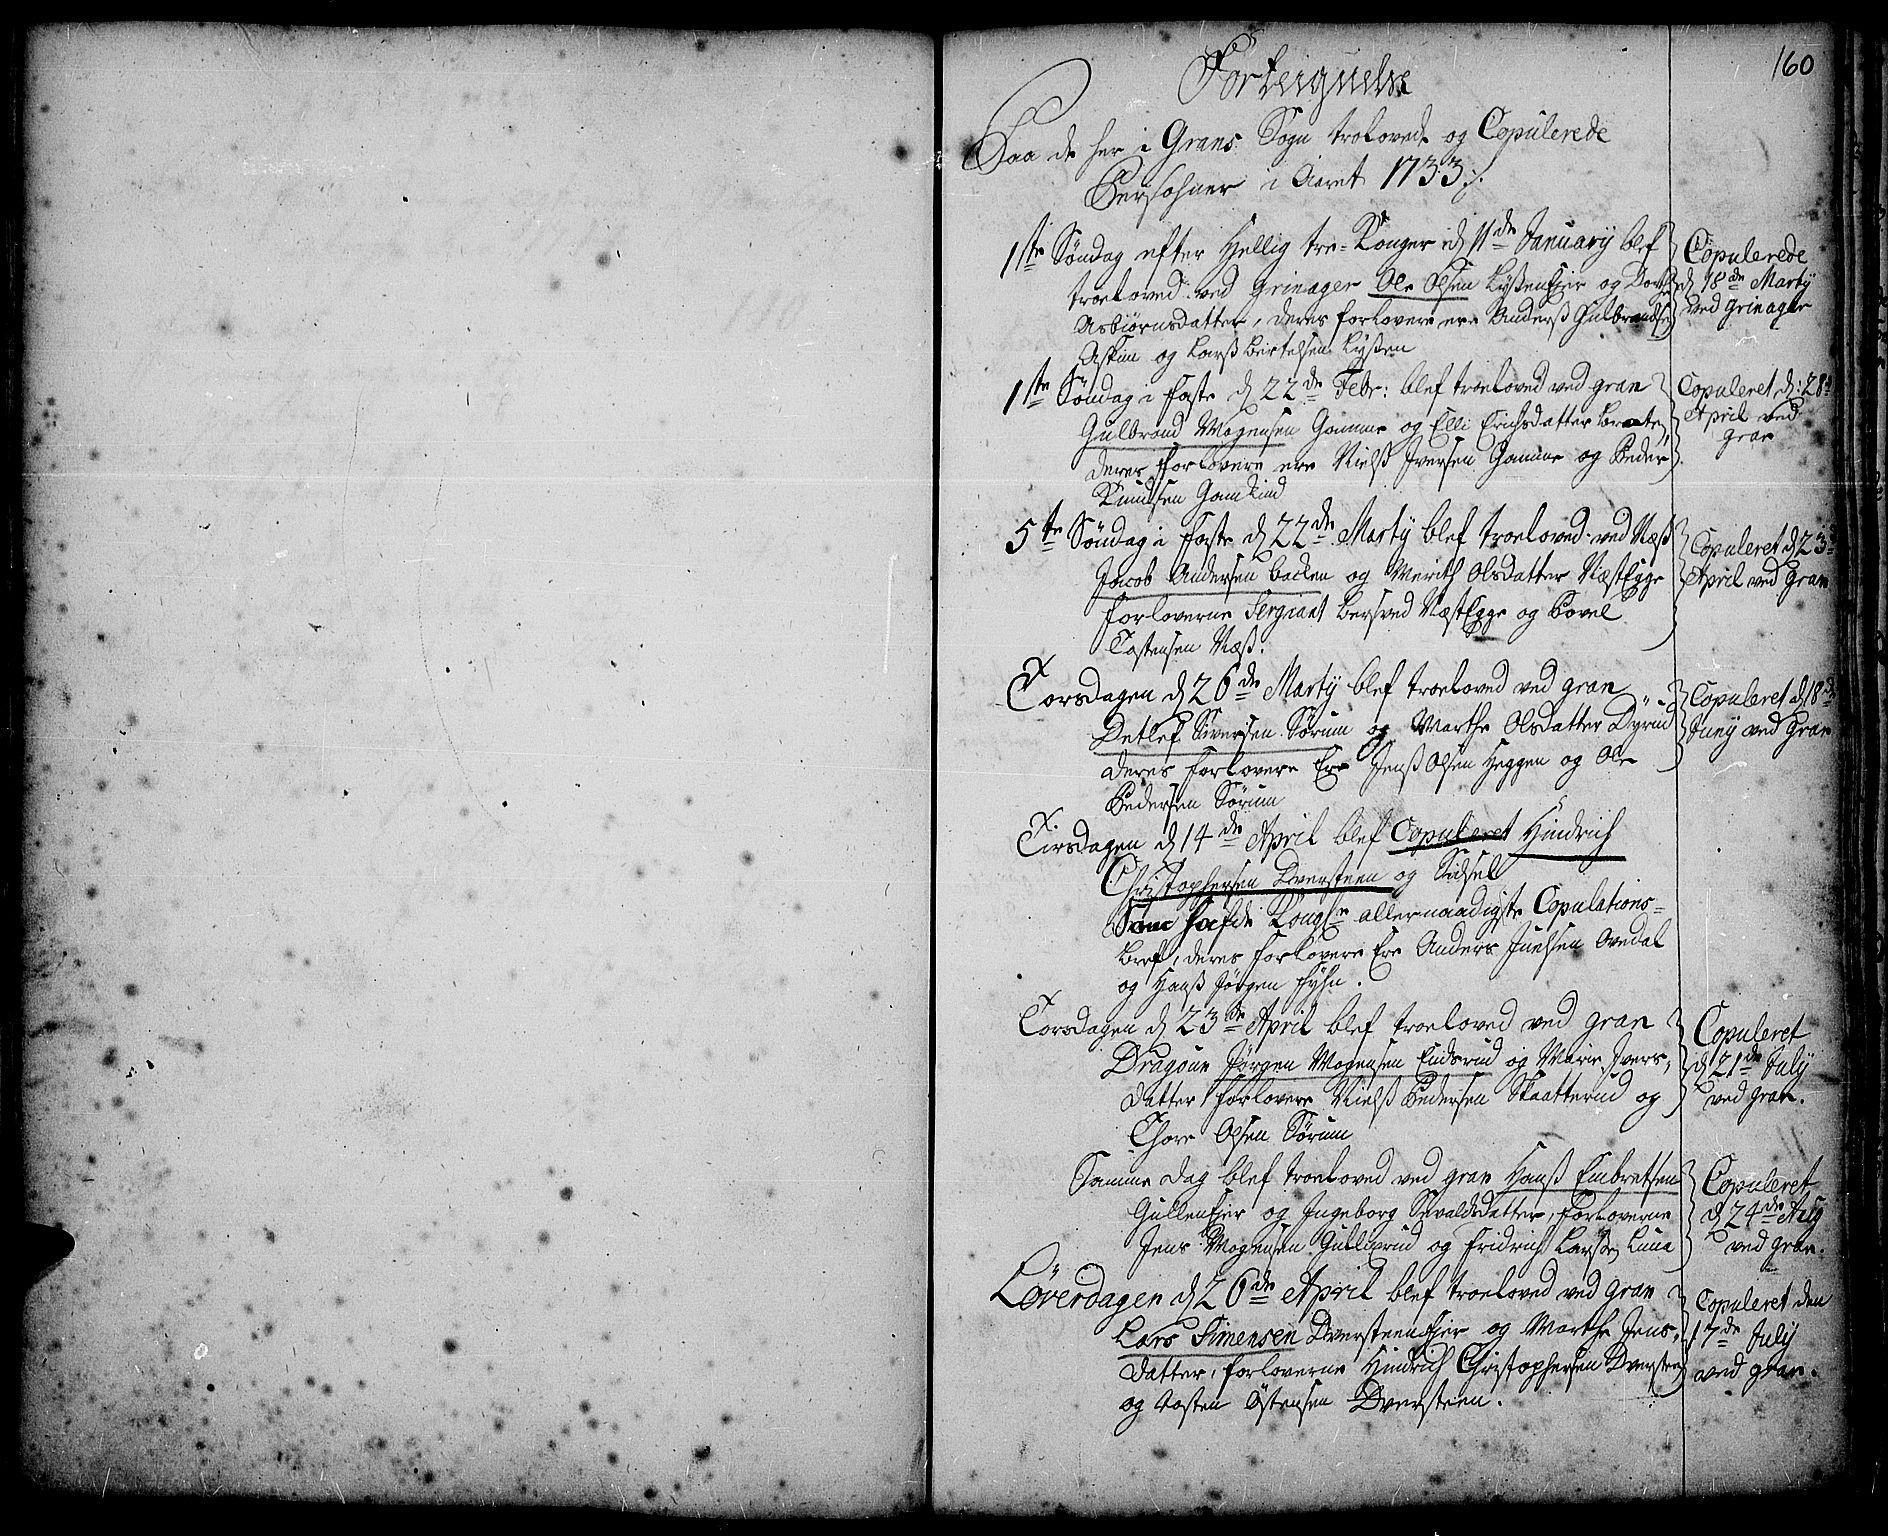 SAH, Gran prestekontor, Ministerialbok nr. 2, 1732-1744, s. 160